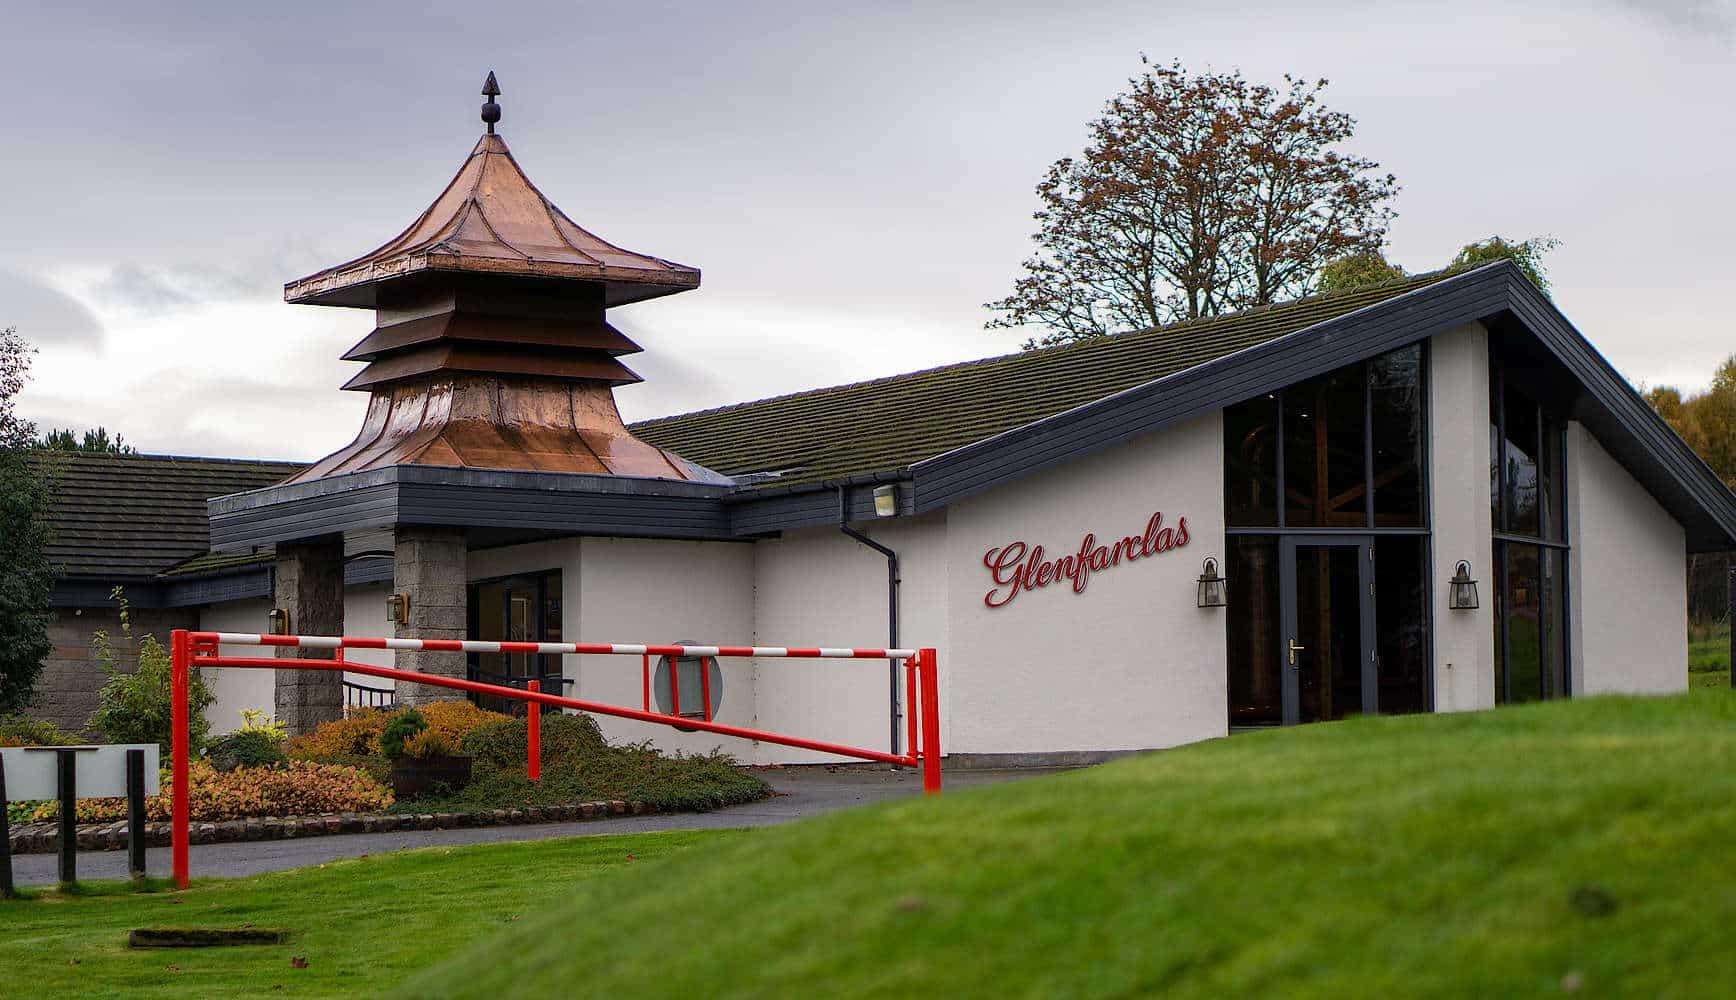 Glenfarclas Distillery Tour